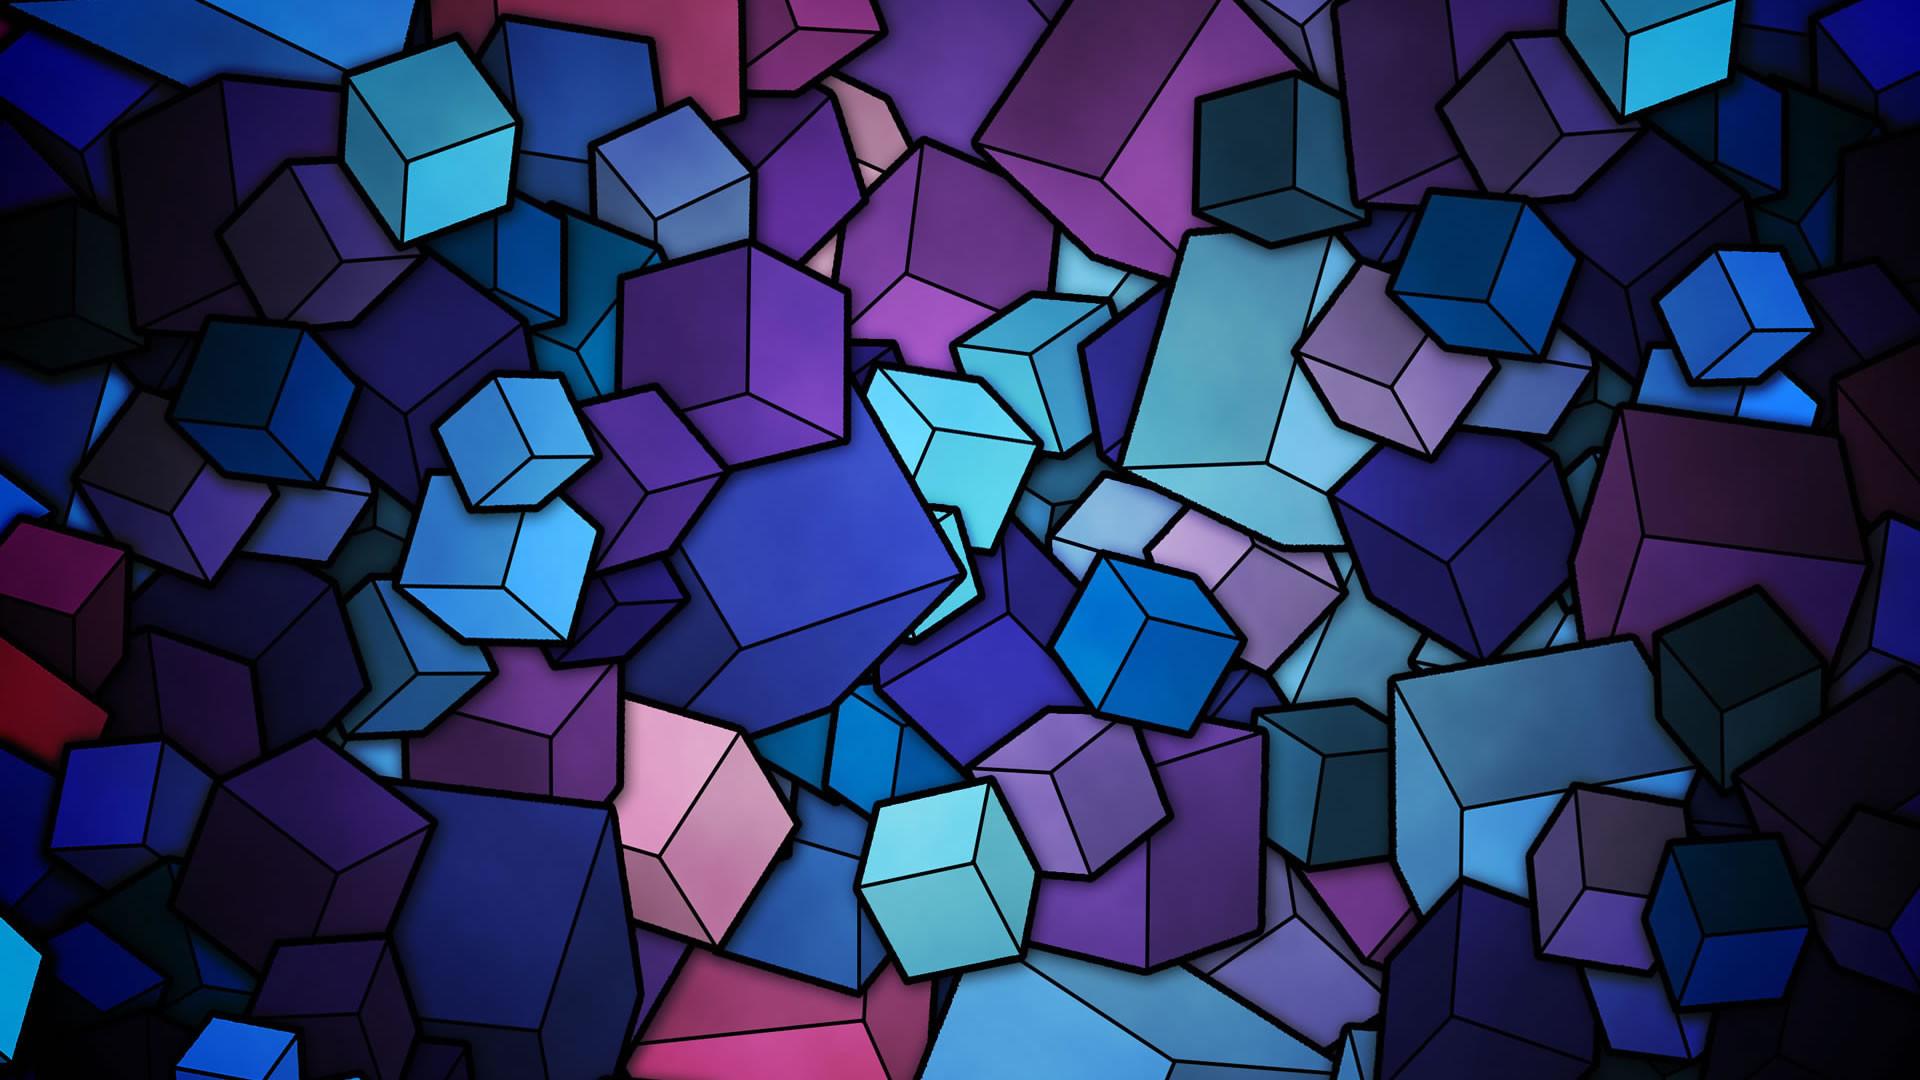 Shape Wallpapers